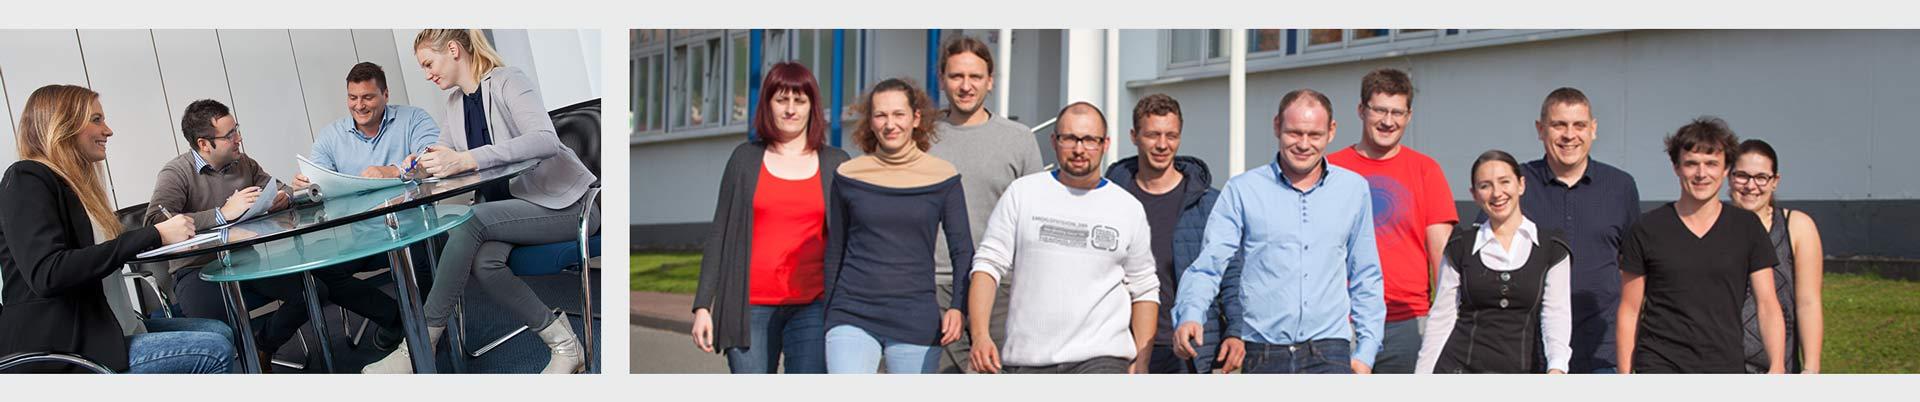 Mws Schmalkalden mendritzki gruppe vacancies